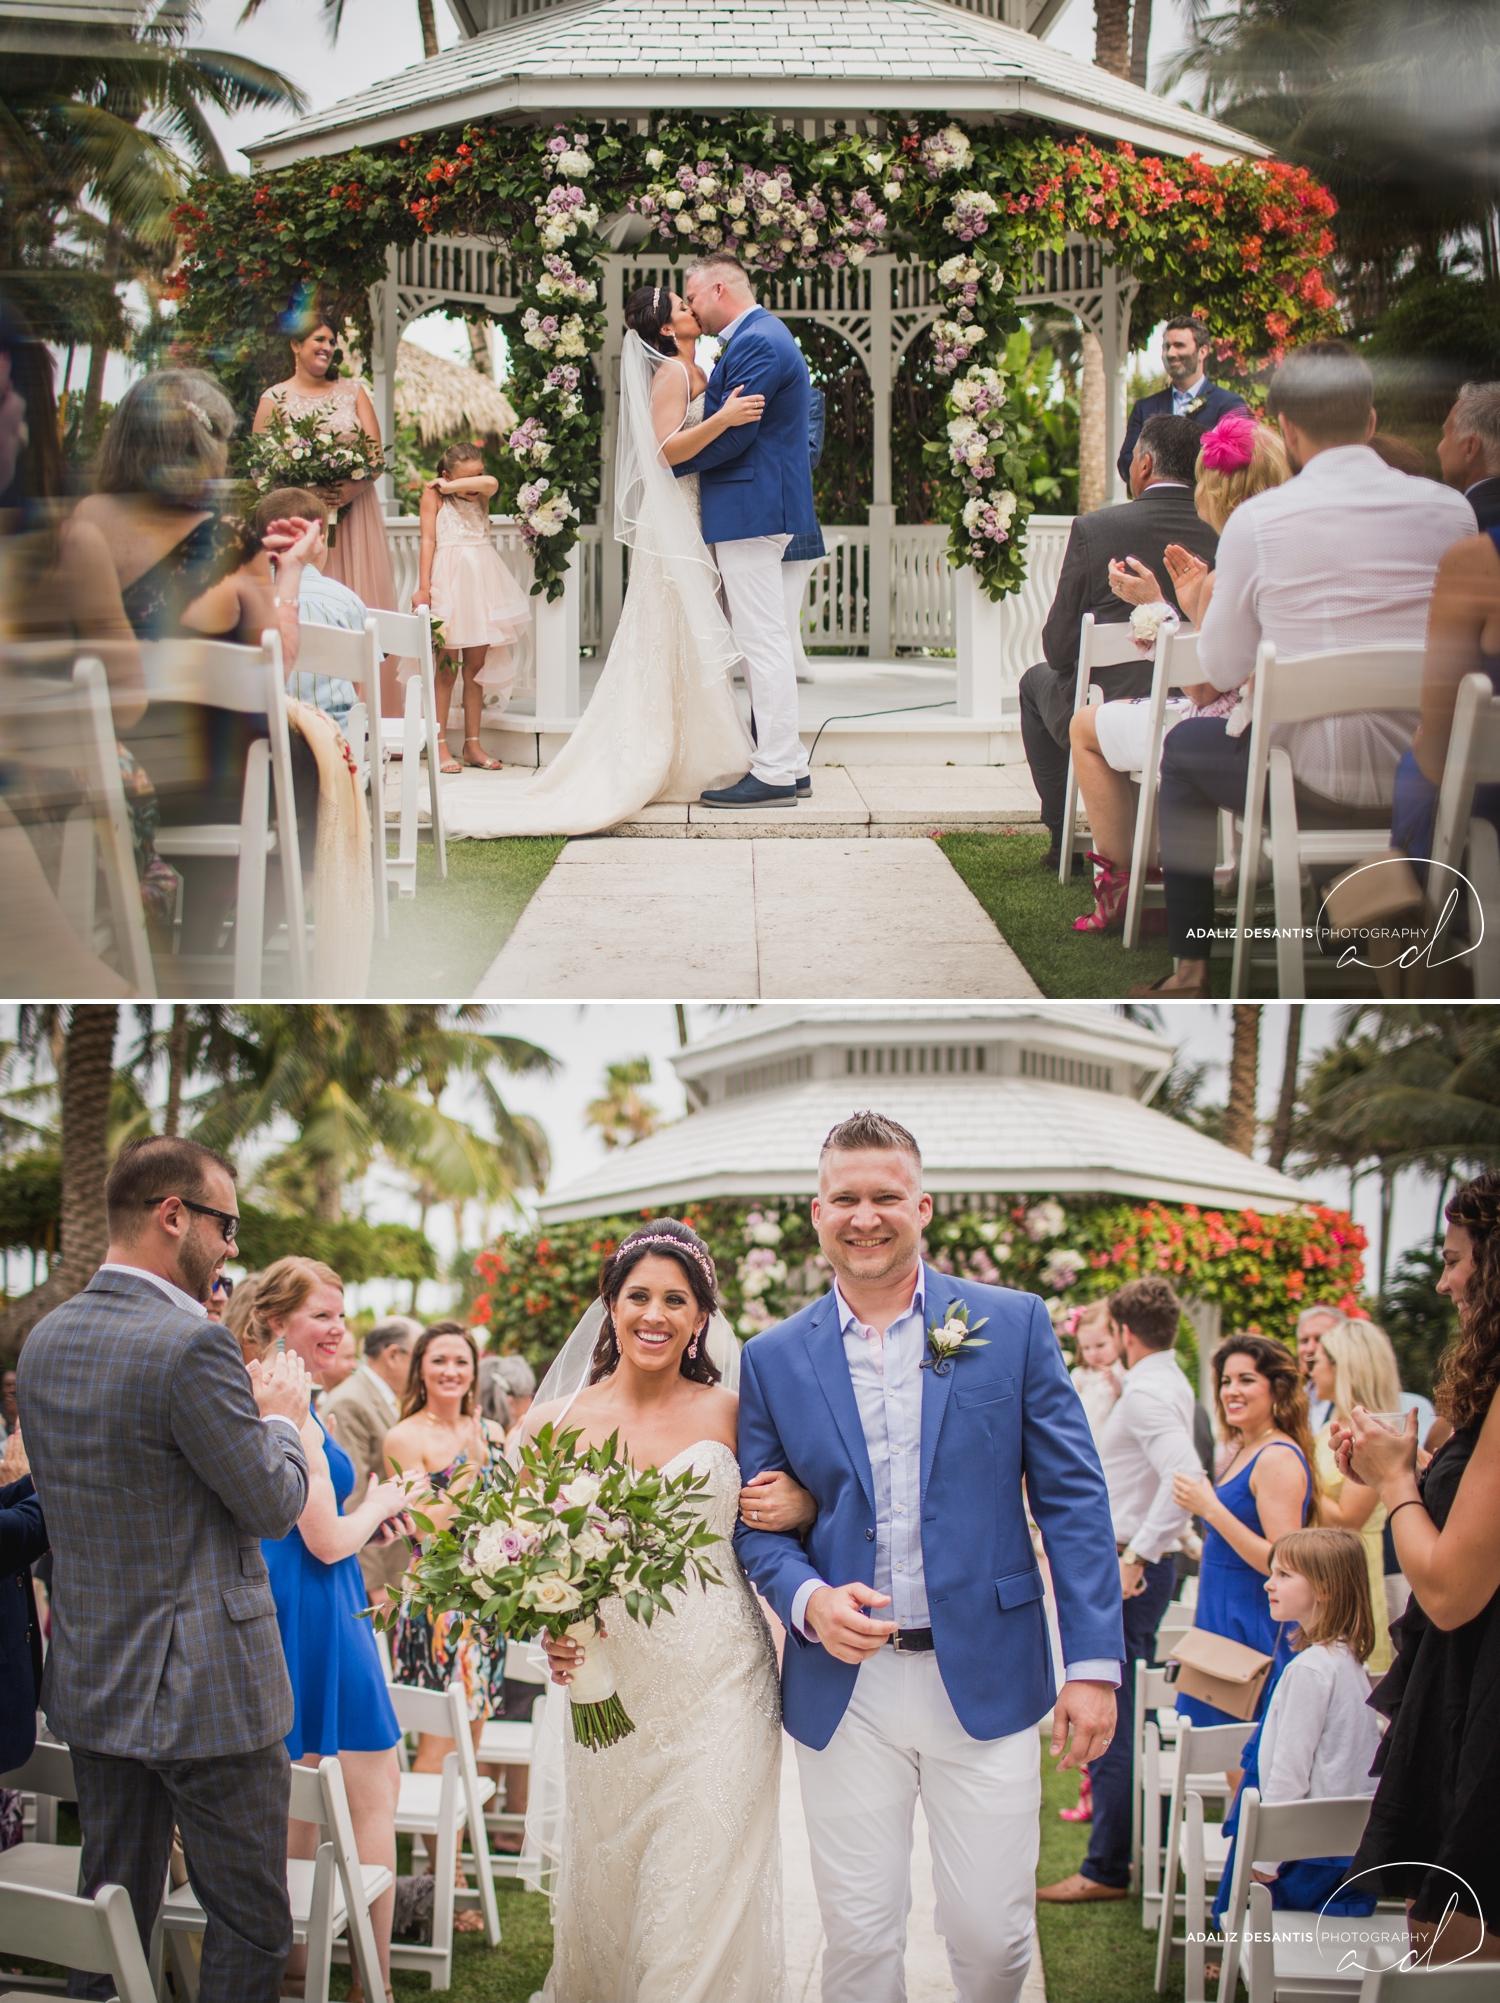 Carmen Alex palms hotel spa miami beach destination wedding lavender roses cuban cigar England cuba bride rose gold elegant Maggie Sottero Badgley Mischka 13.jpg